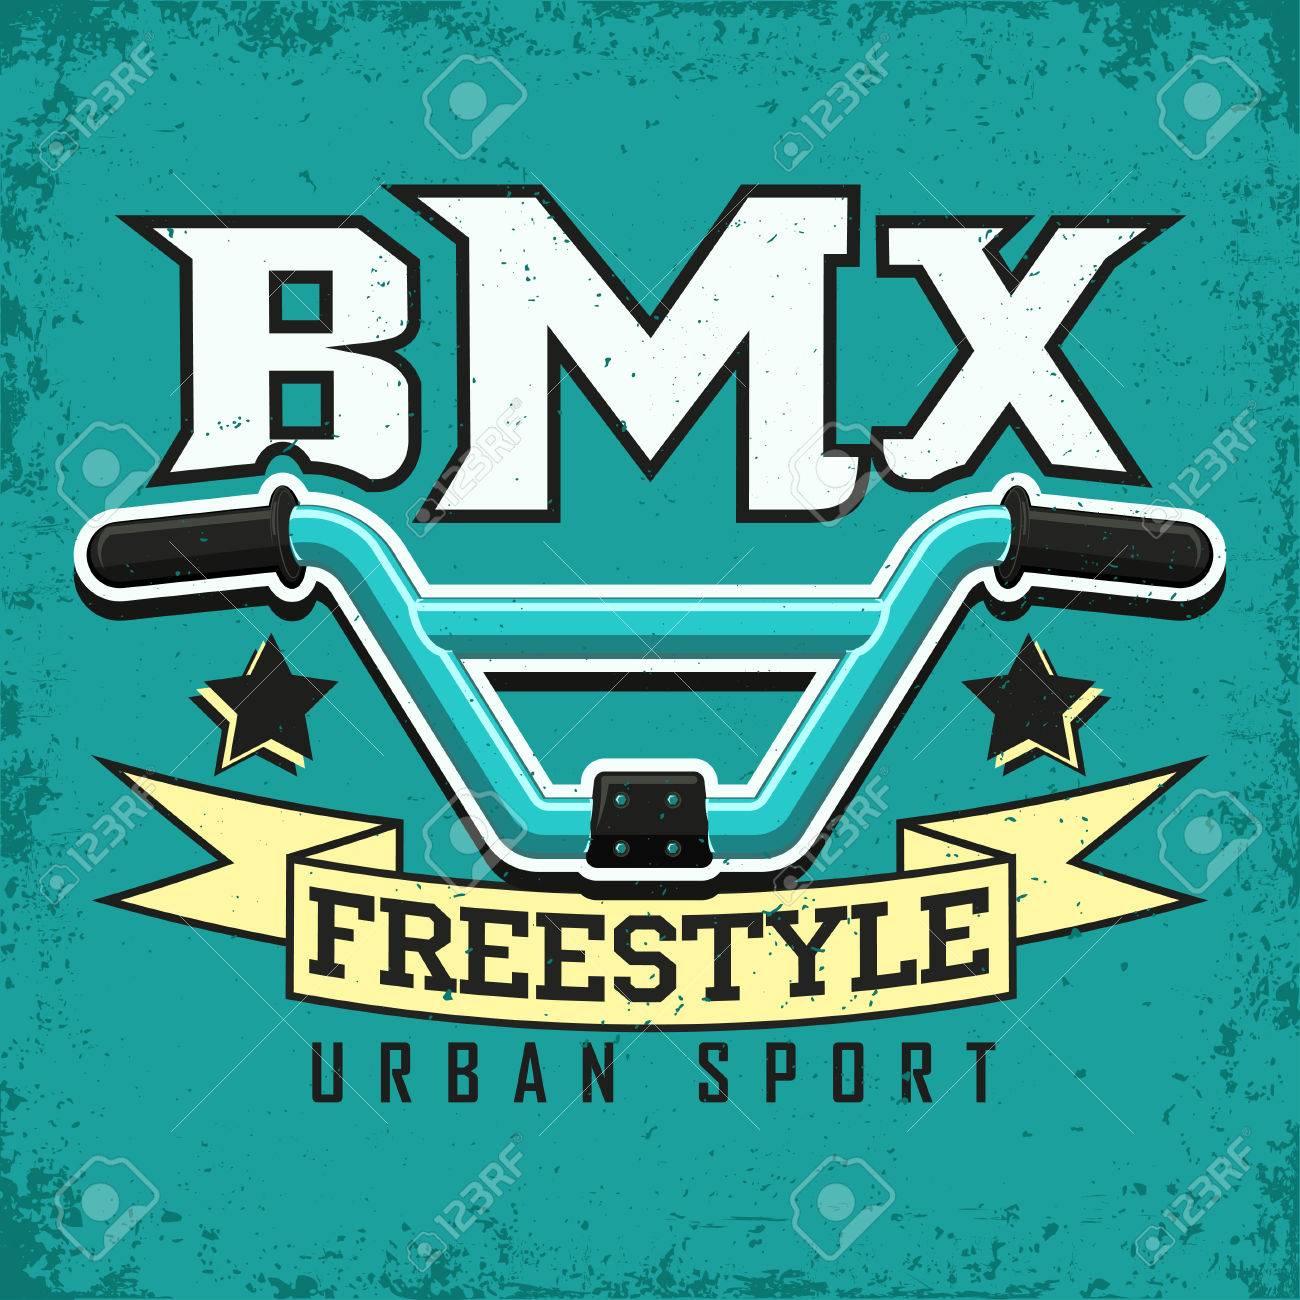 Vintage t-shirt graphic design, grange print stamp, bmx typography emblem, bmx freestyle sports logo Creative design, Vector - 69004333